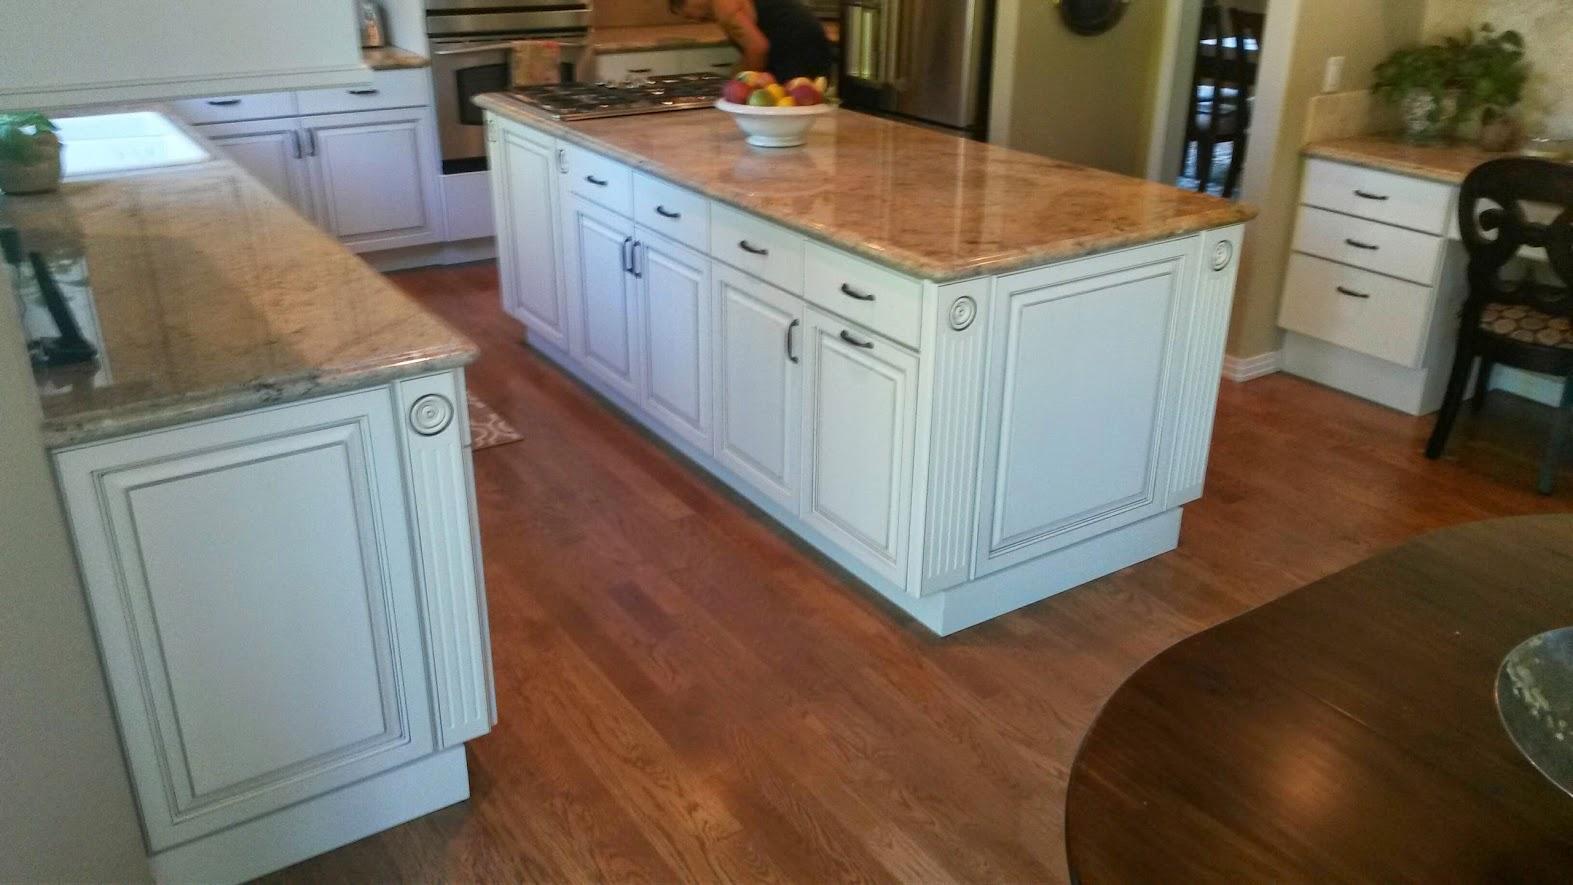 Tester - Home Improvements of Colorado